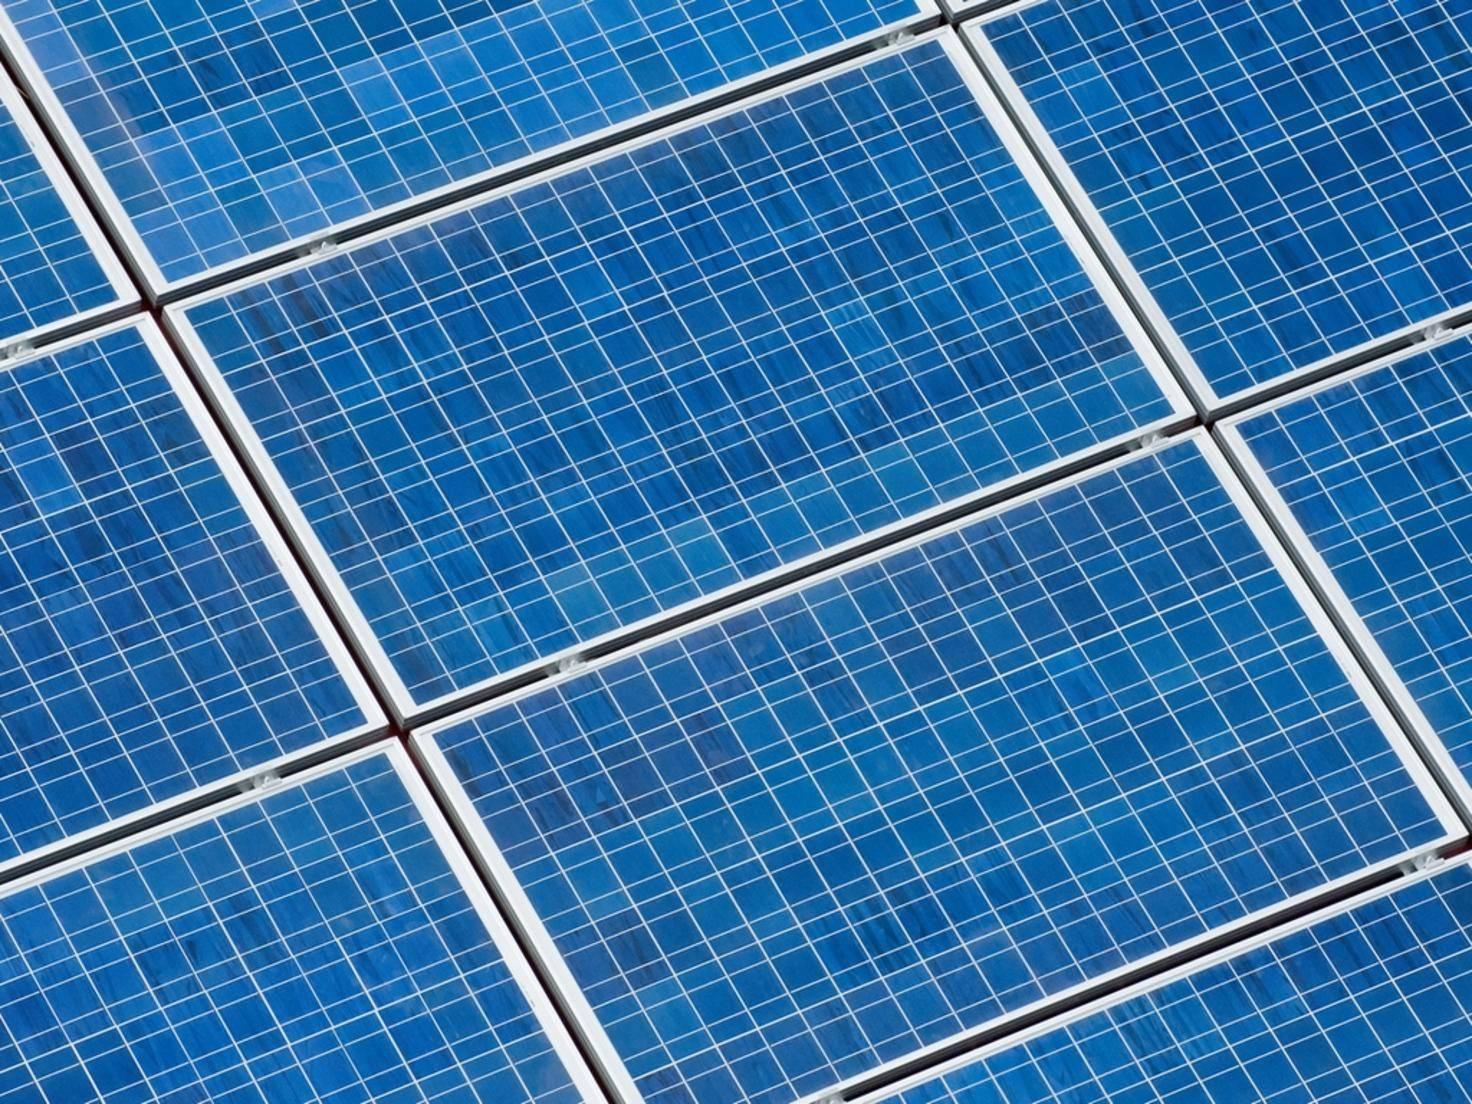 Wayne National Forest Solar Panel Construction